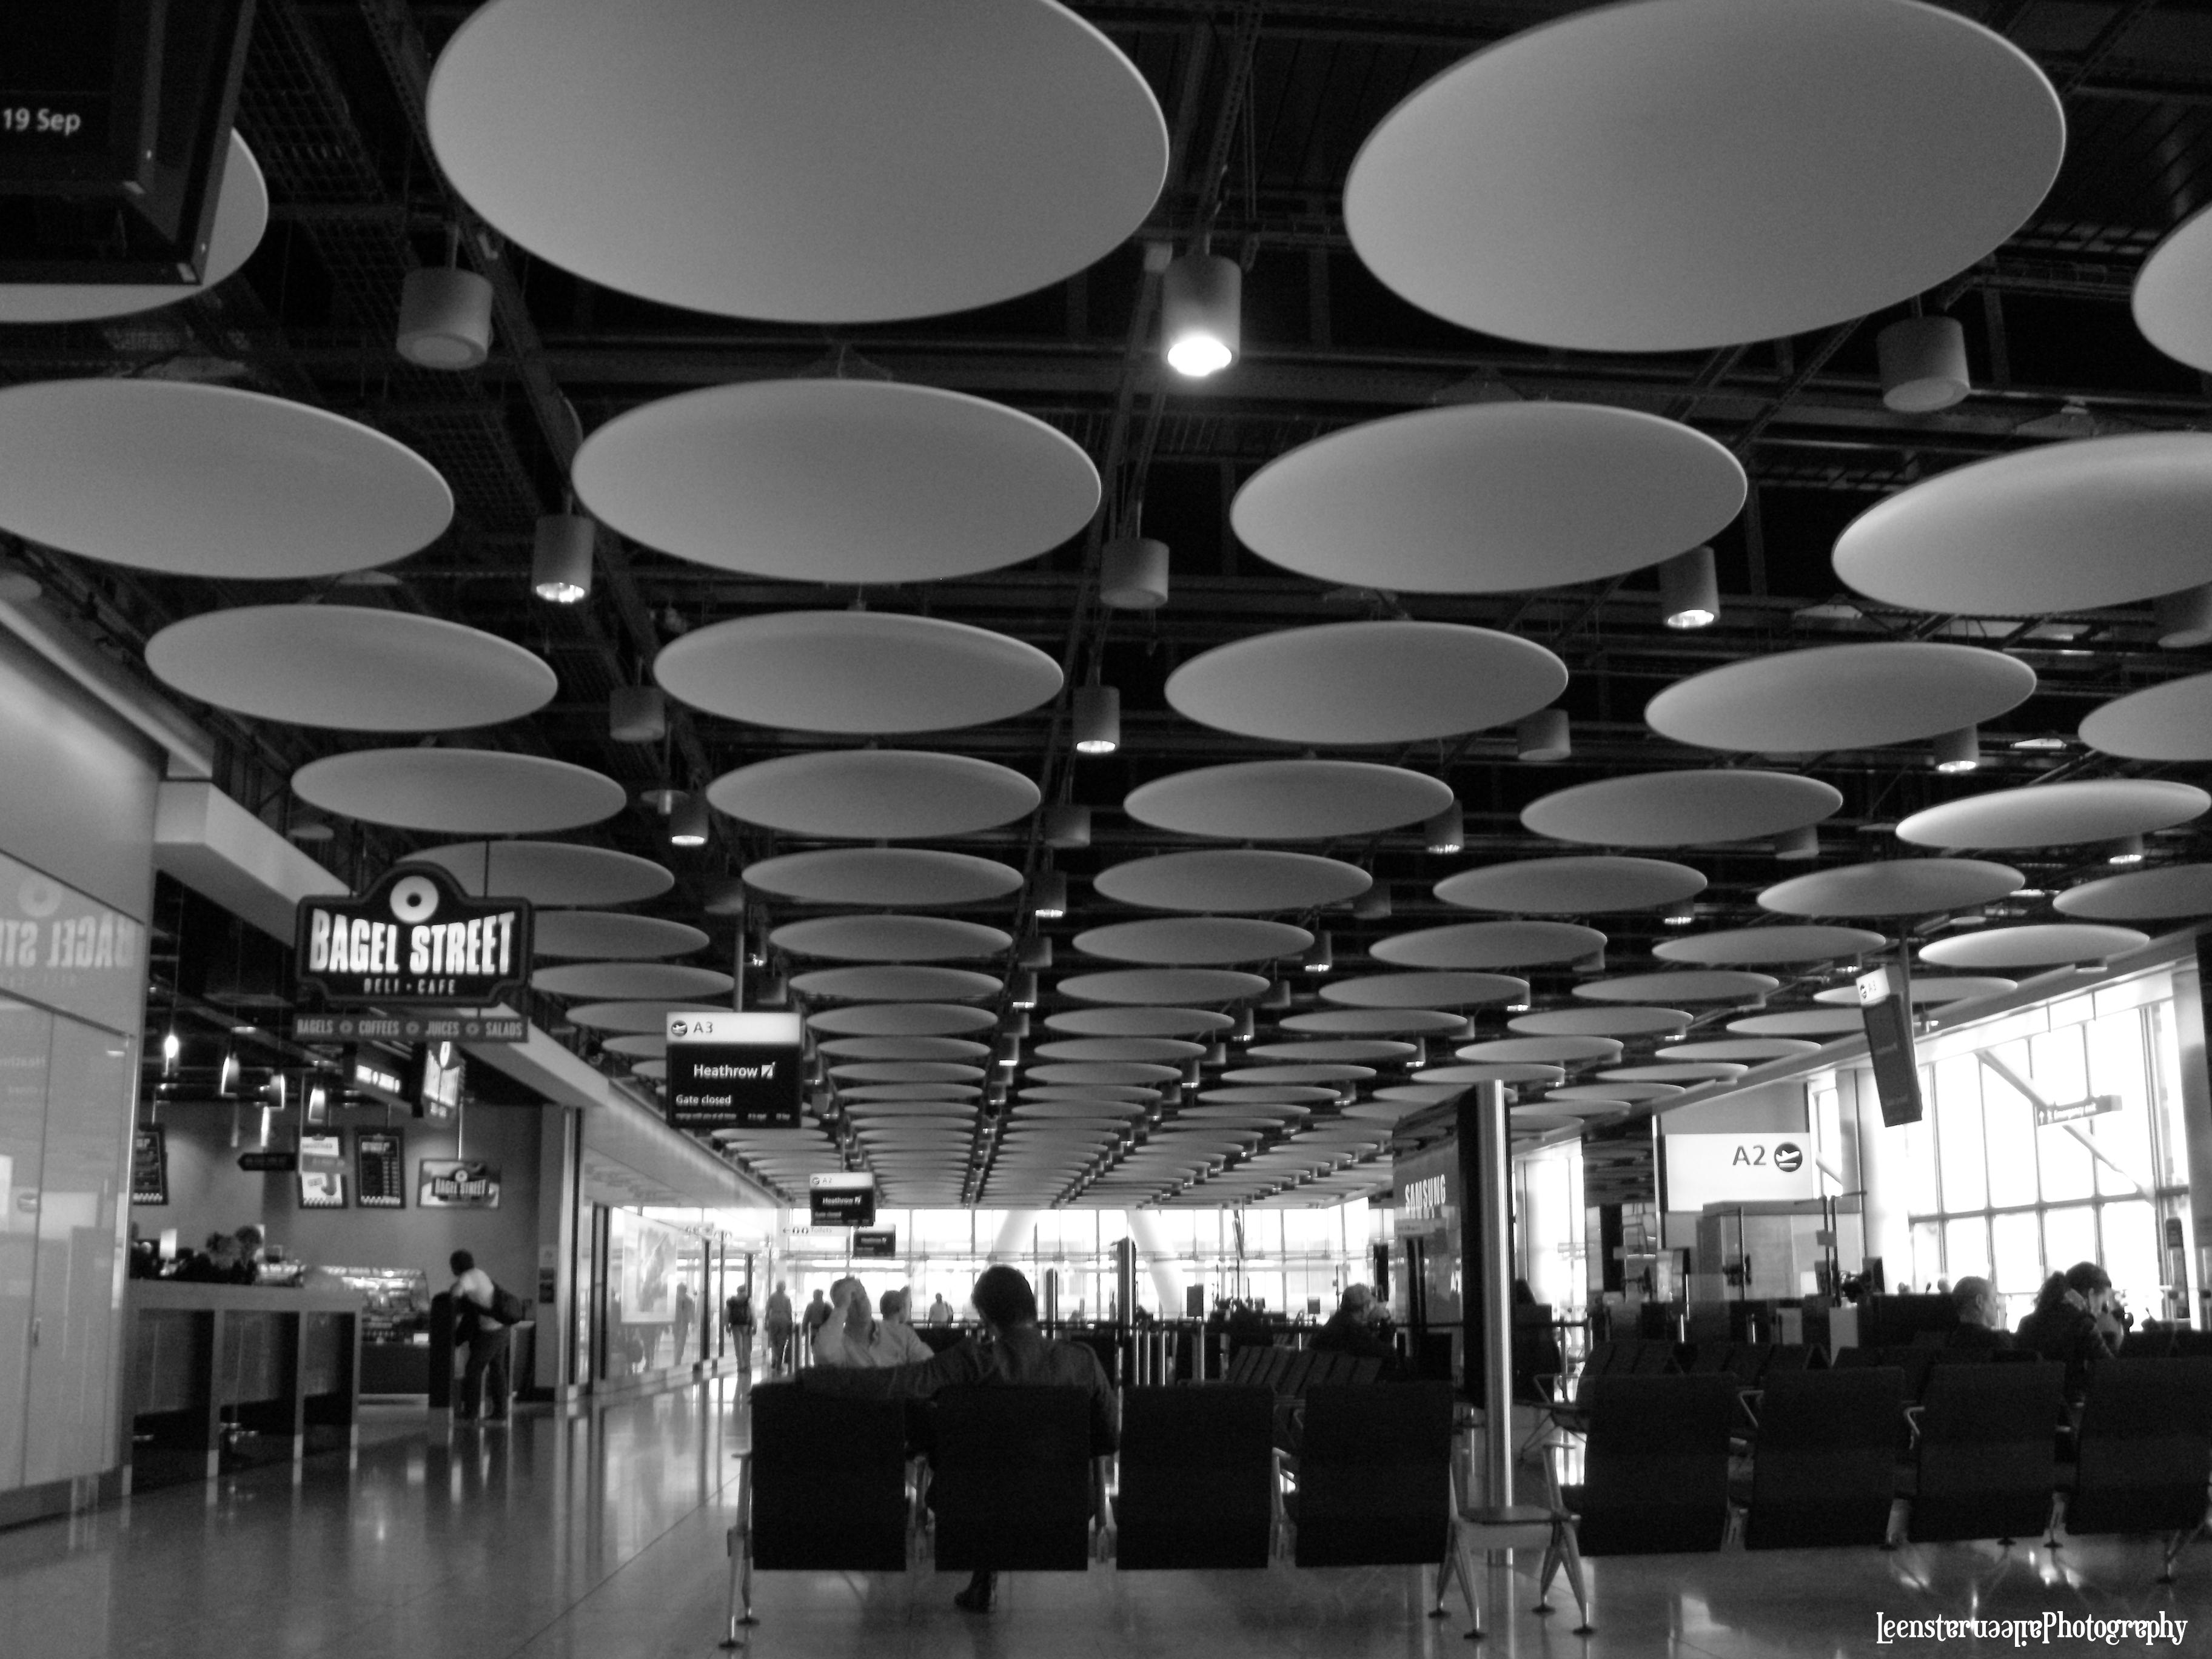 Heathrow London Airport